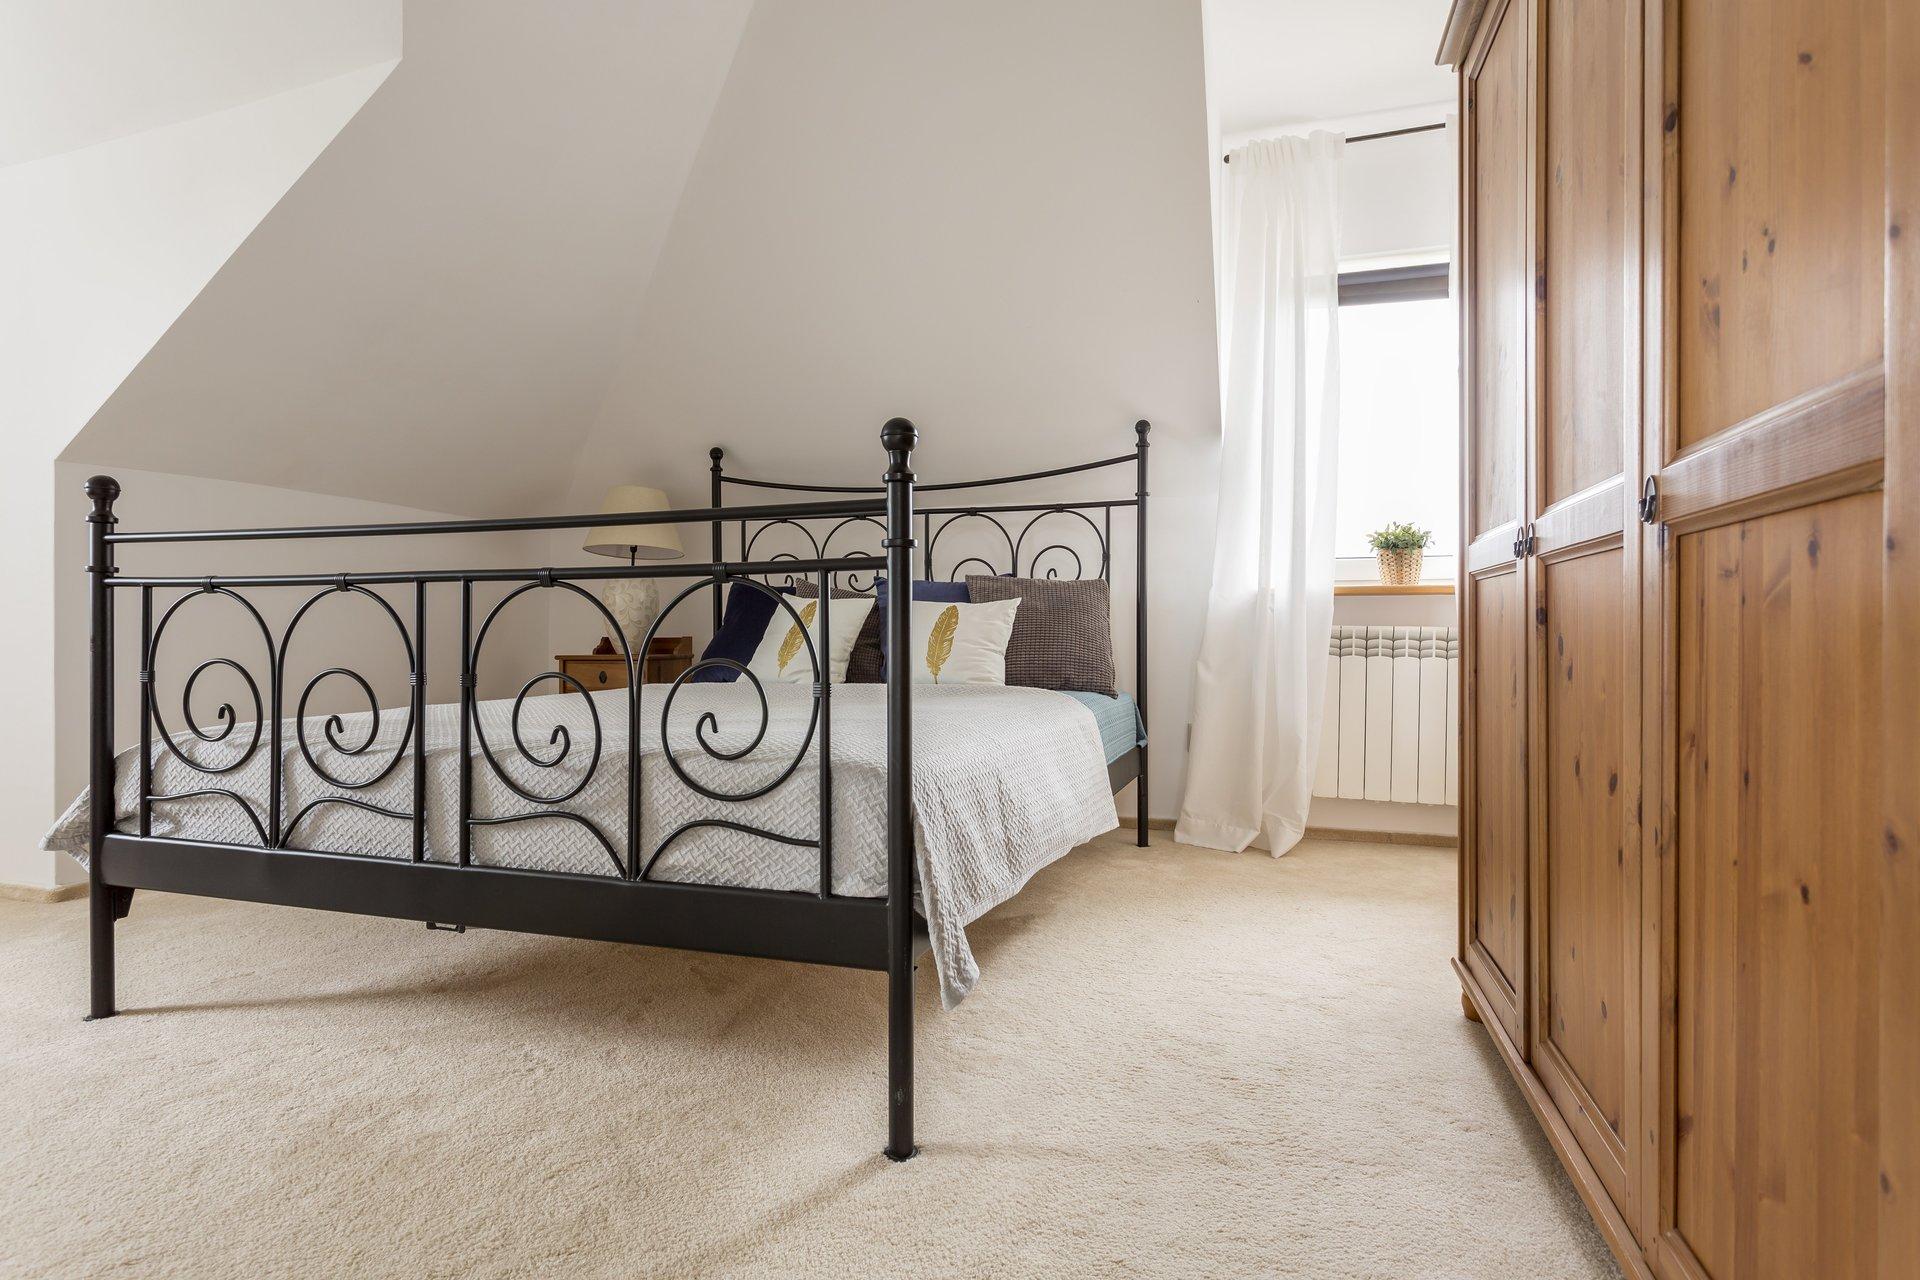 betten schmidt die schlafexperten. Black Bedroom Furniture Sets. Home Design Ideas